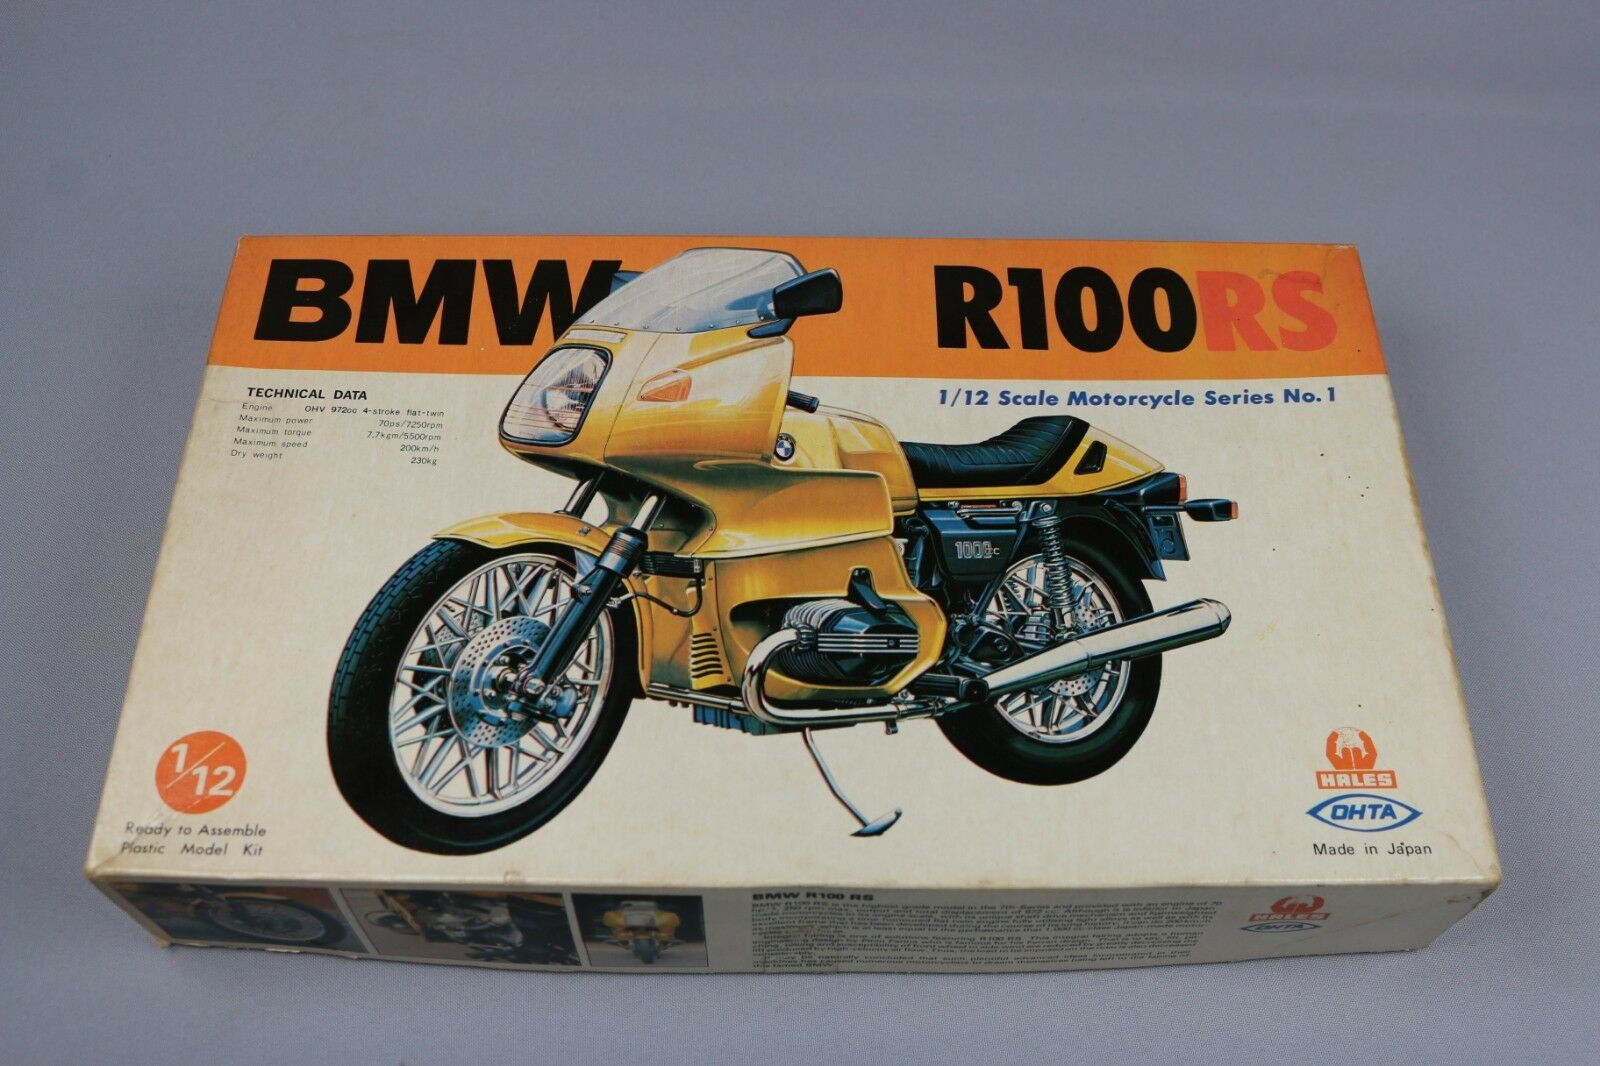 Zf1033 Hales Hales Hales Ohta 1 12 Modell M12021-1000 BMW R100rs Motorcycle Serien No. 1 eddf0b